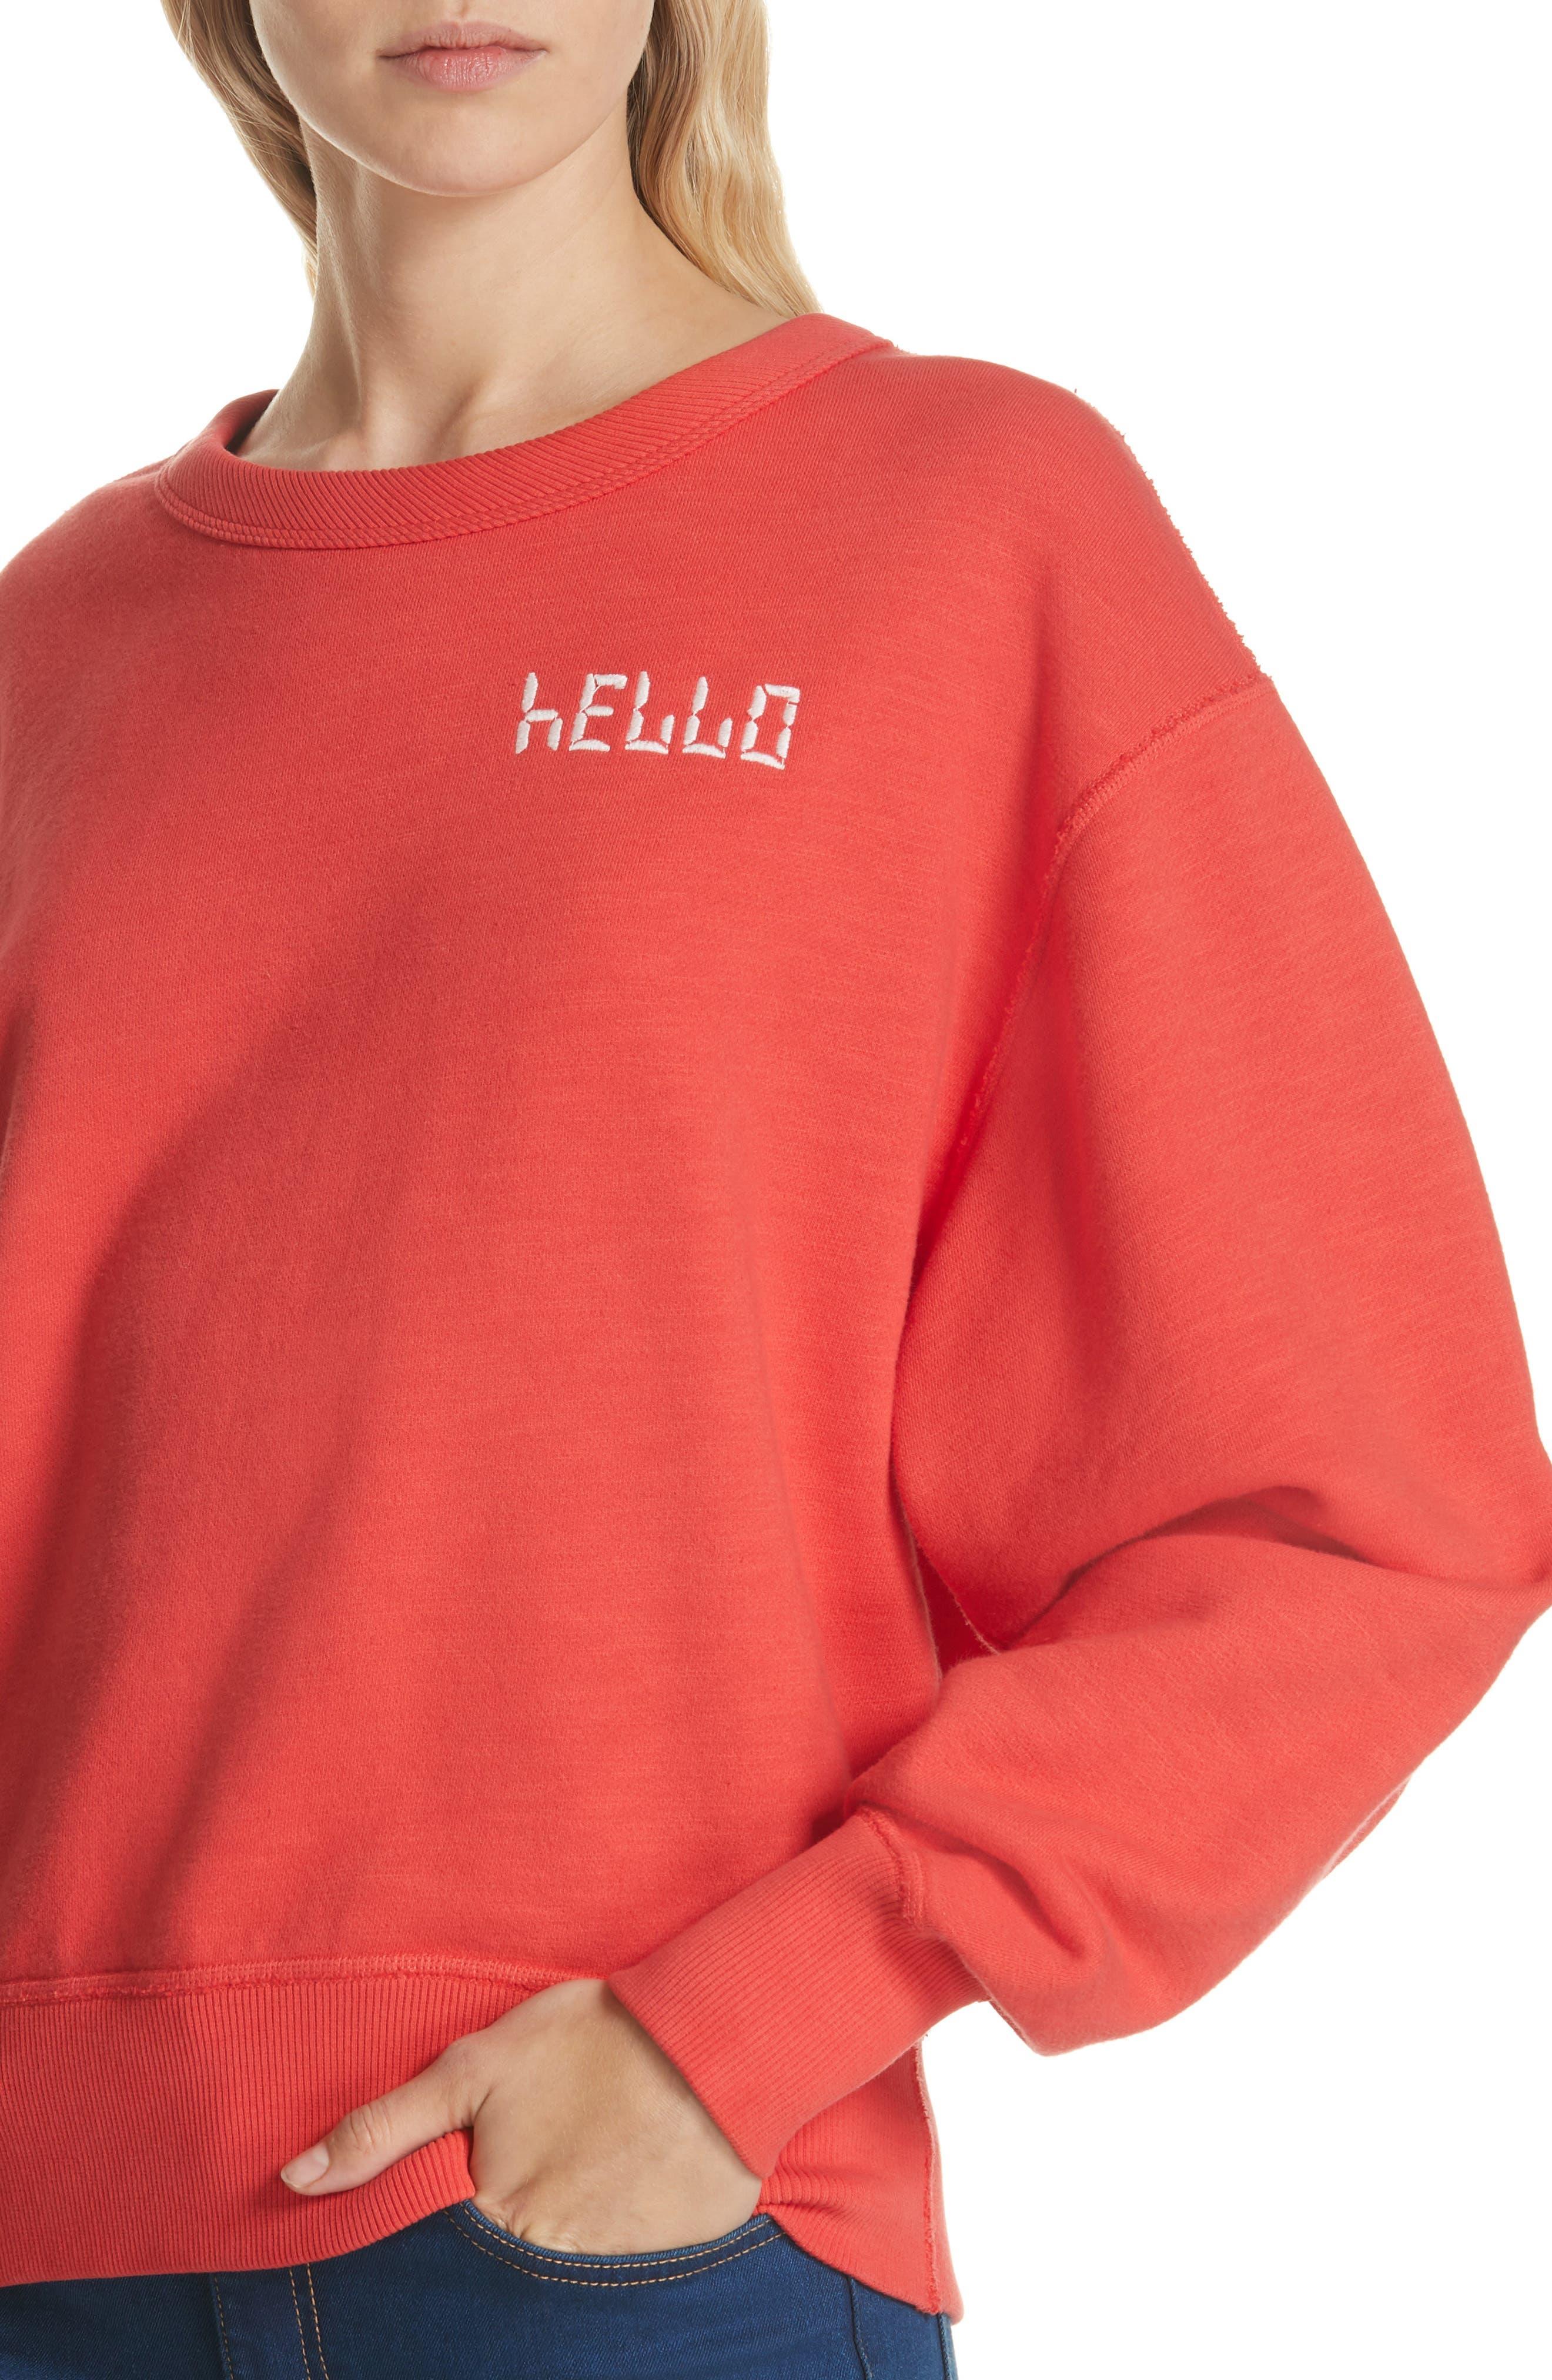 Hello Sweatshirt,                             Alternate thumbnail 4, color,                             CANDY APPLE